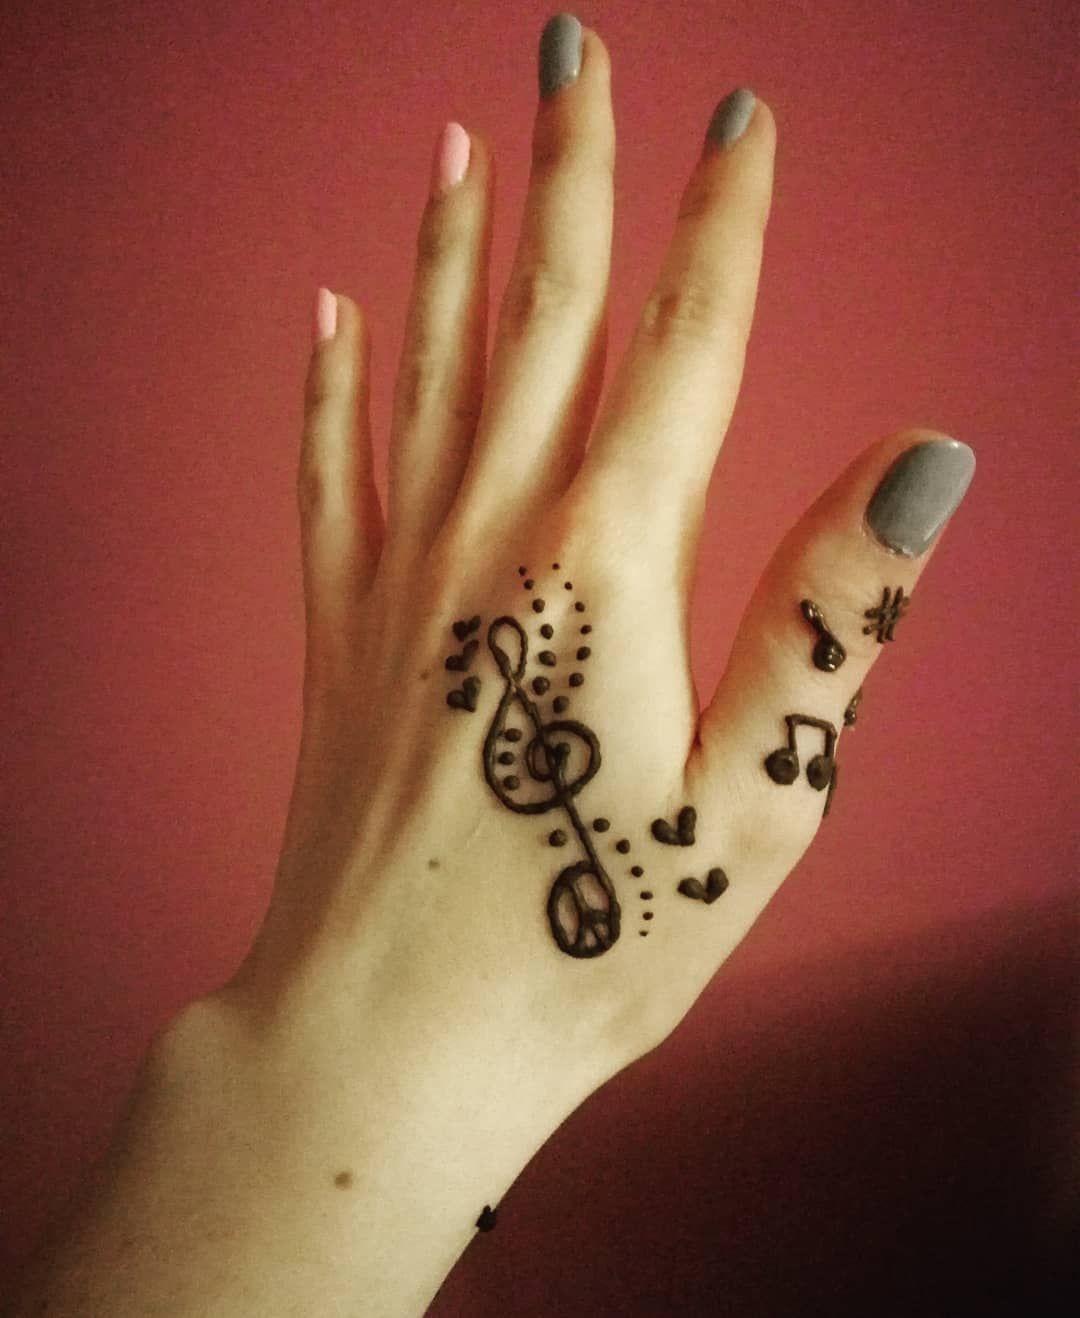 e8fd5629d #music #musicispower #musicnotes #musician #love #newyear #hello #2018 # henna #hennatattoo #indianstyle #indianwife #india #indiadiaries #indialove  #mehndi ...